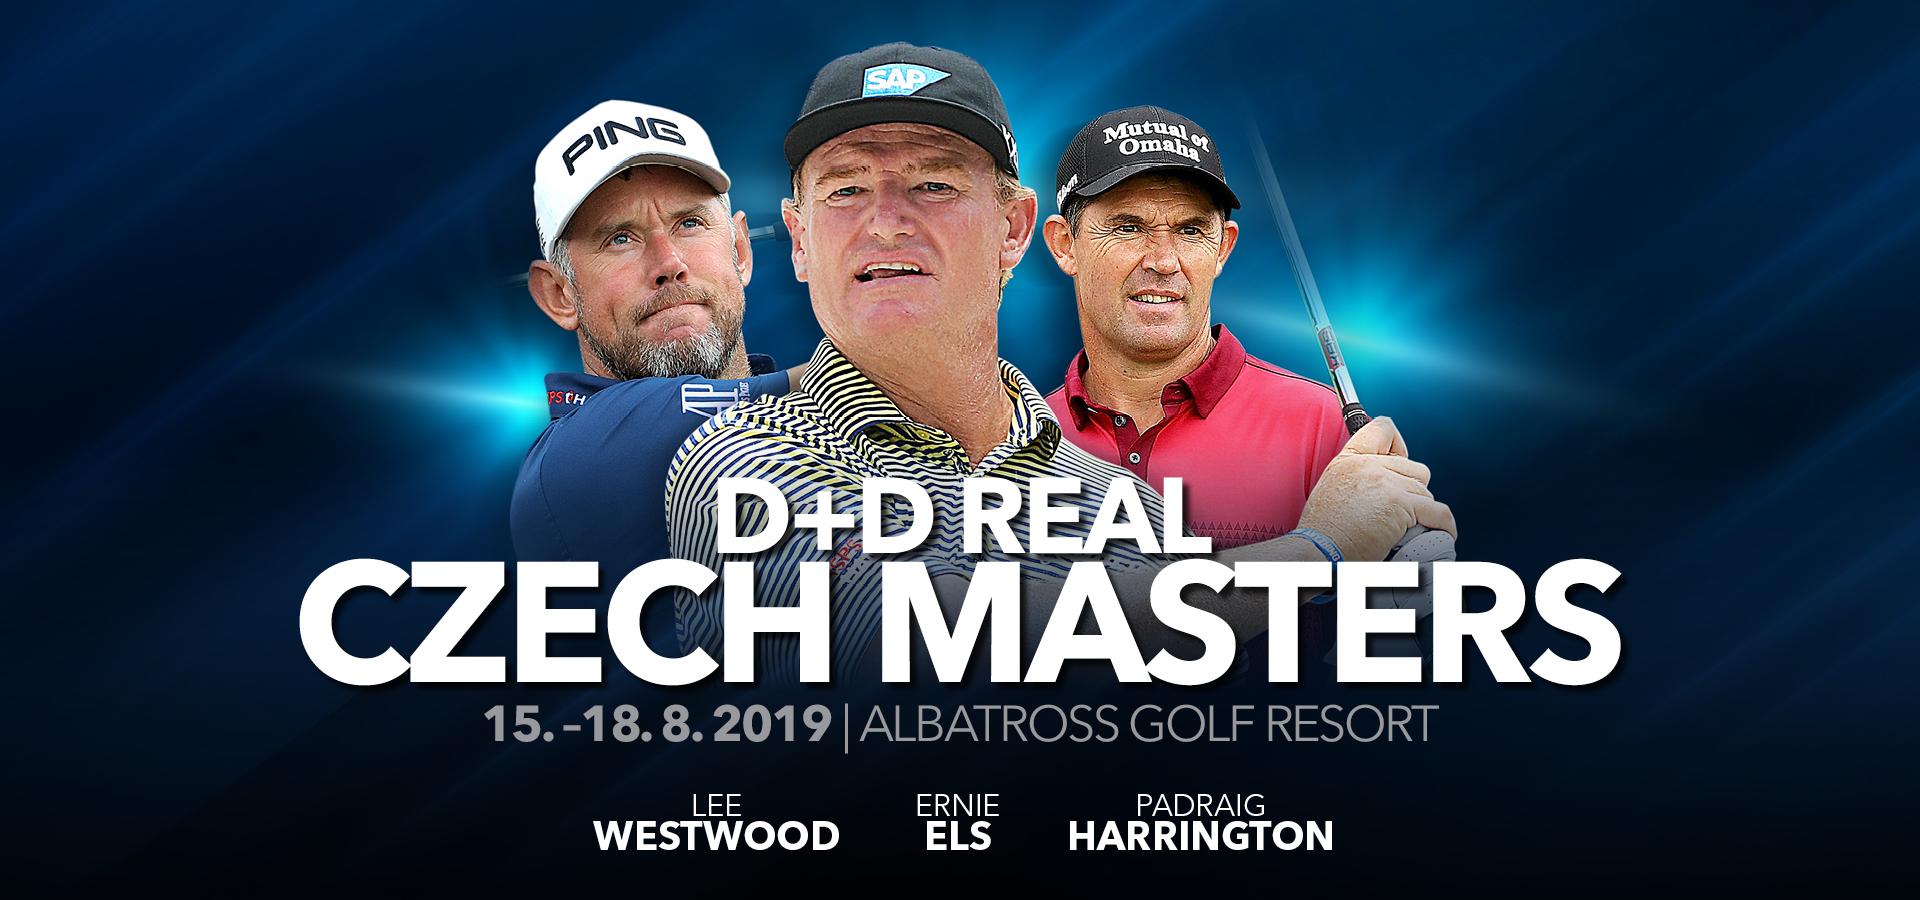 D+D REAL Czech Masters 2019 - Největší golfový turnaj v ČR na Albatrossu!